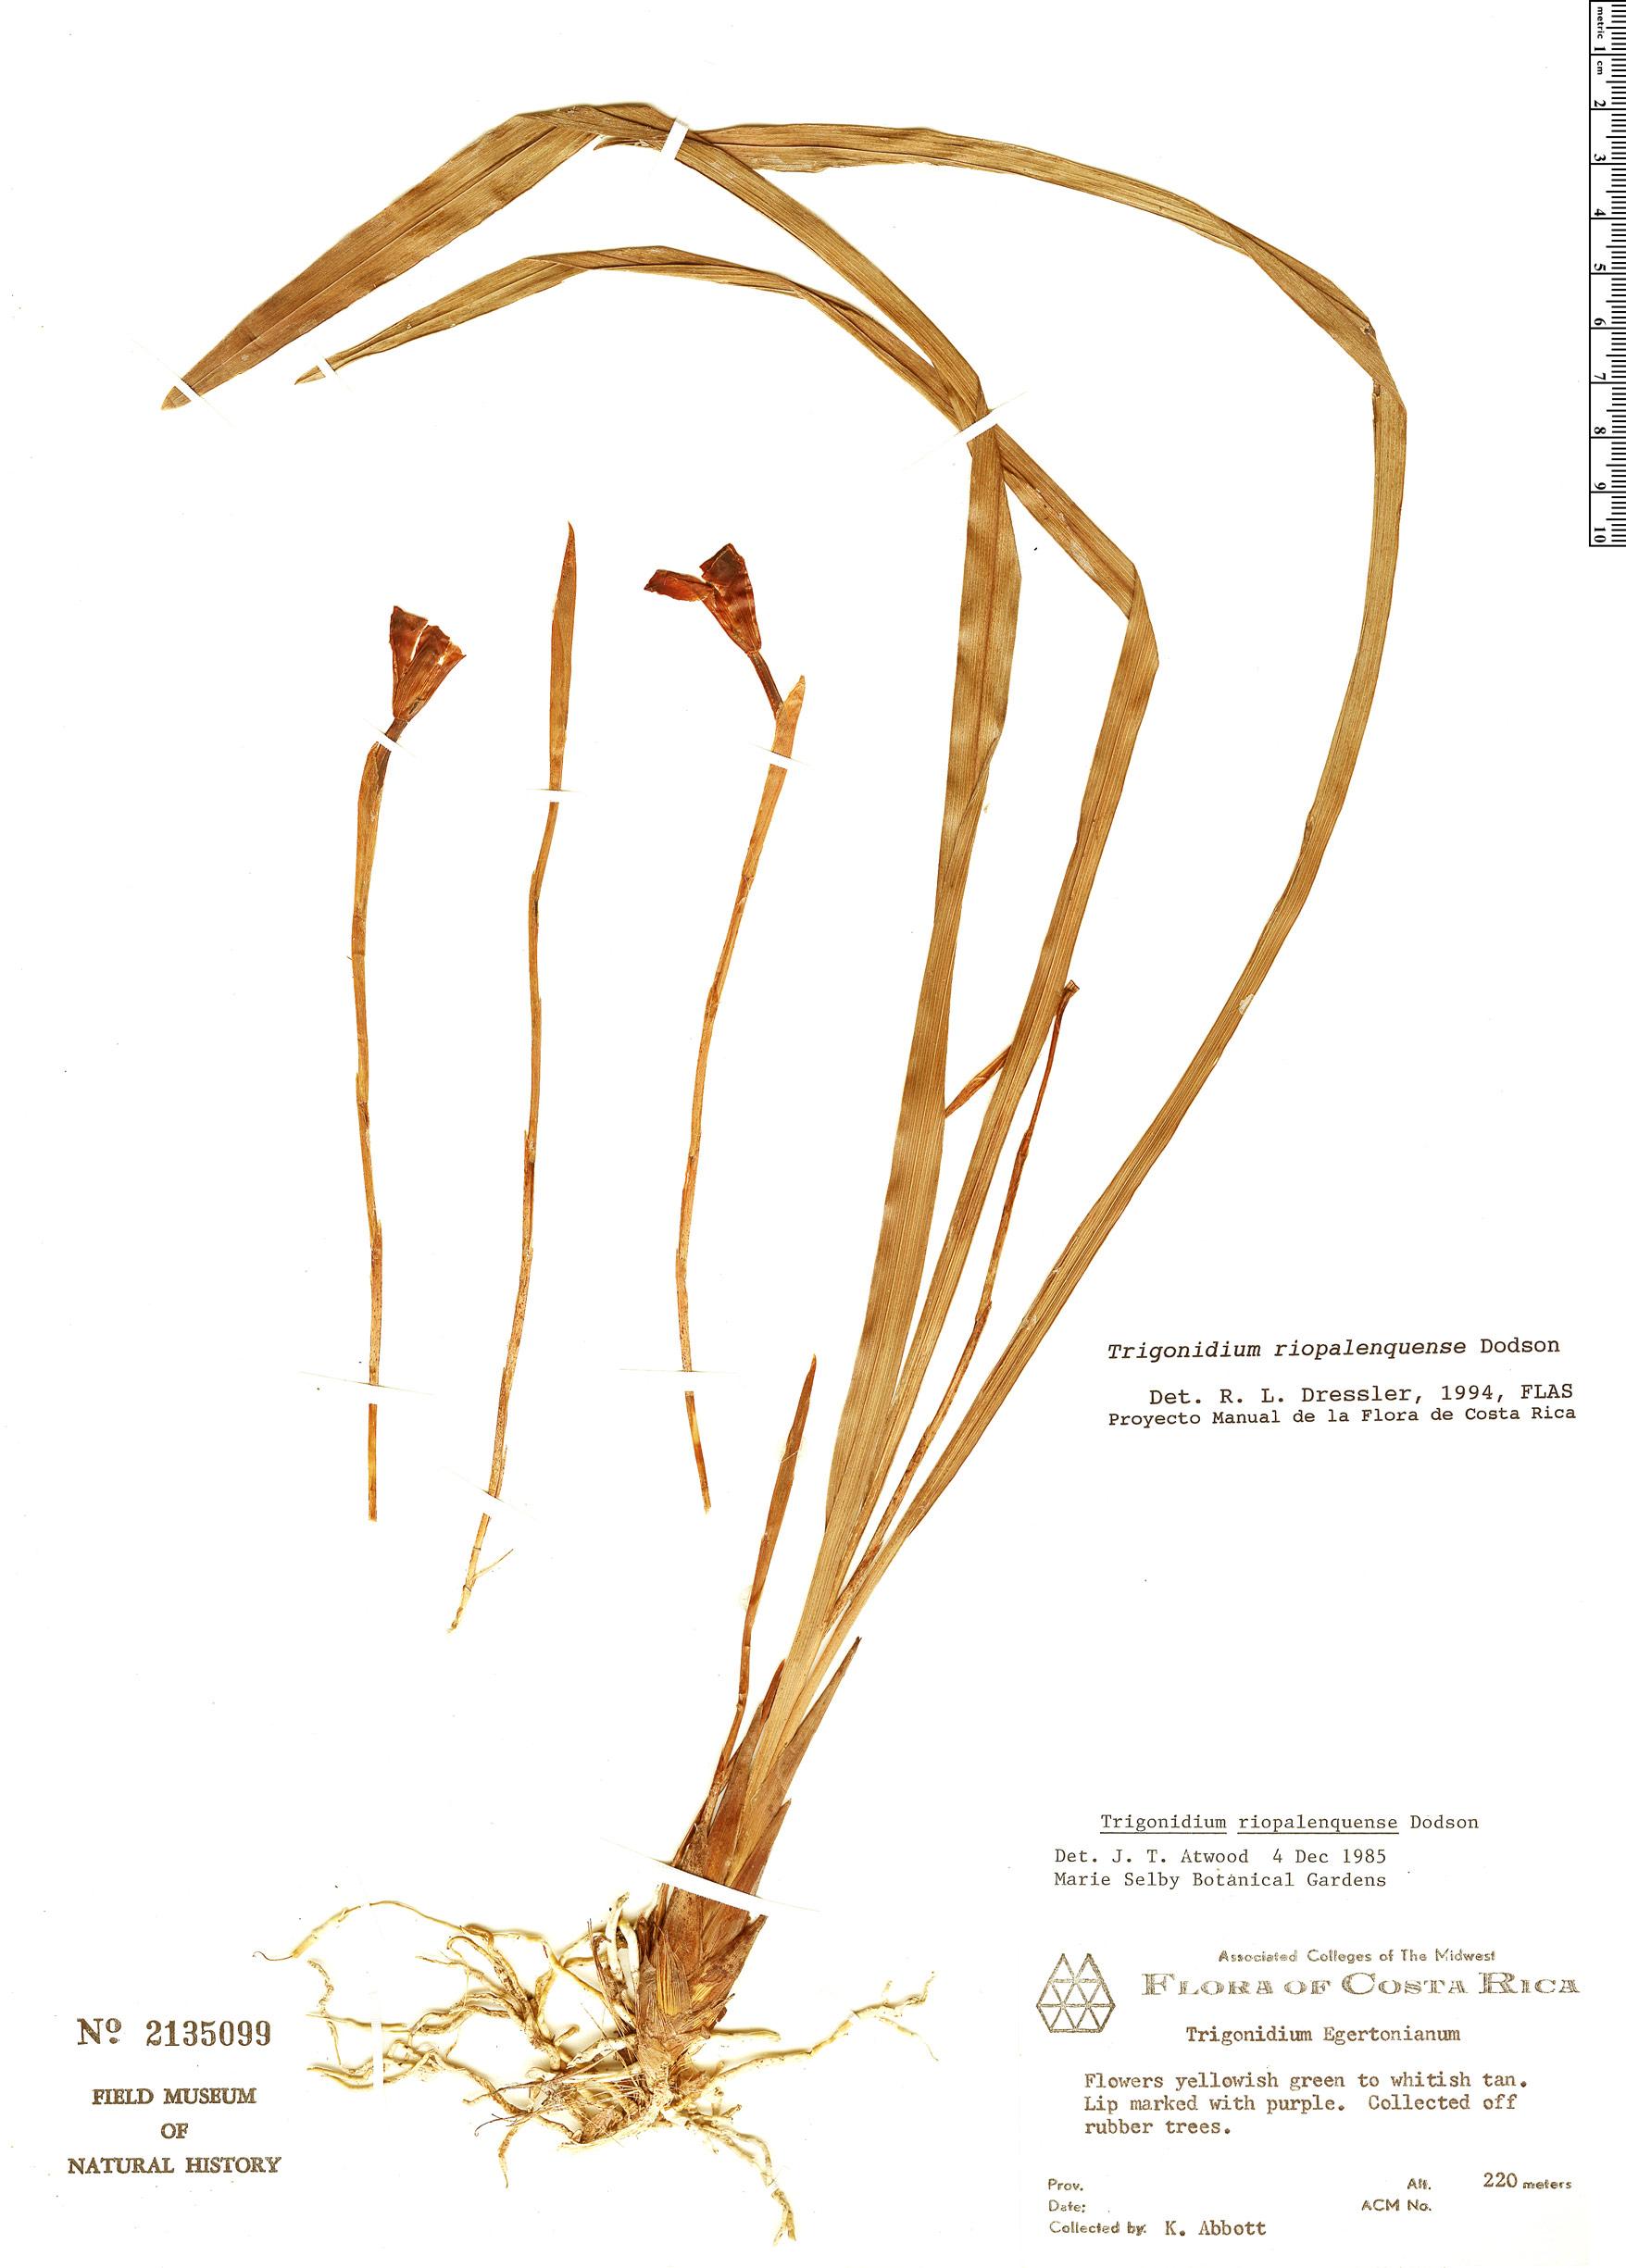 Espécimen: Trigonidium riopalenquense